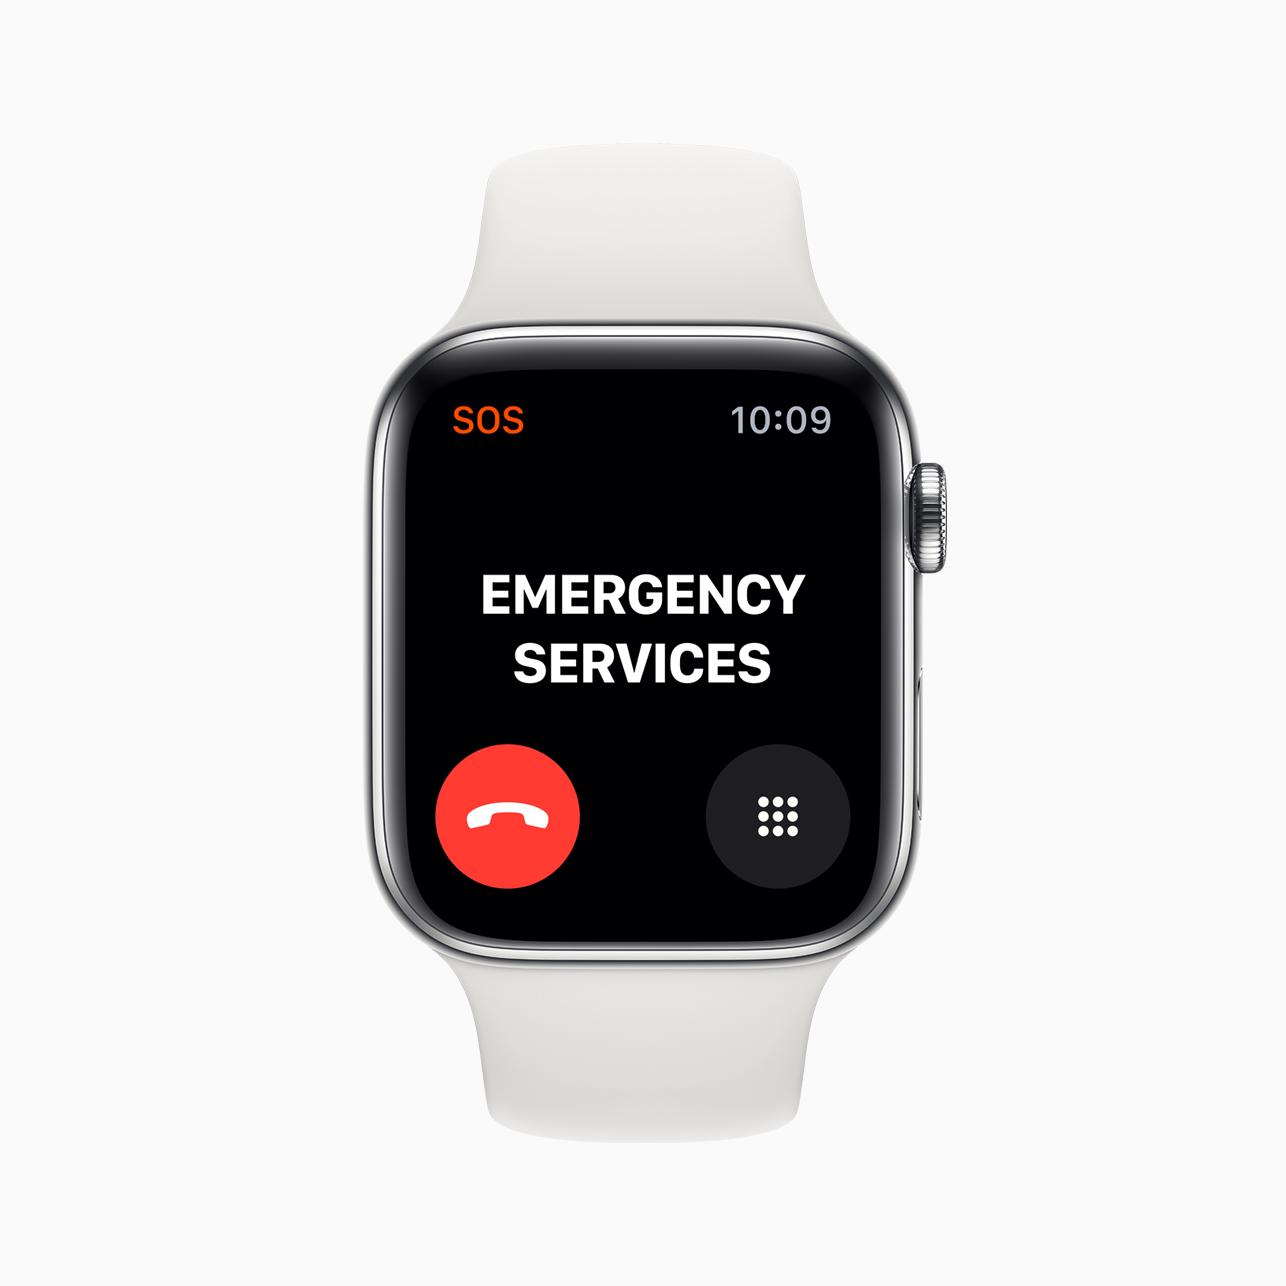 apple_watch_series_5-sos-call-emergency-services-screen-091019.jpg